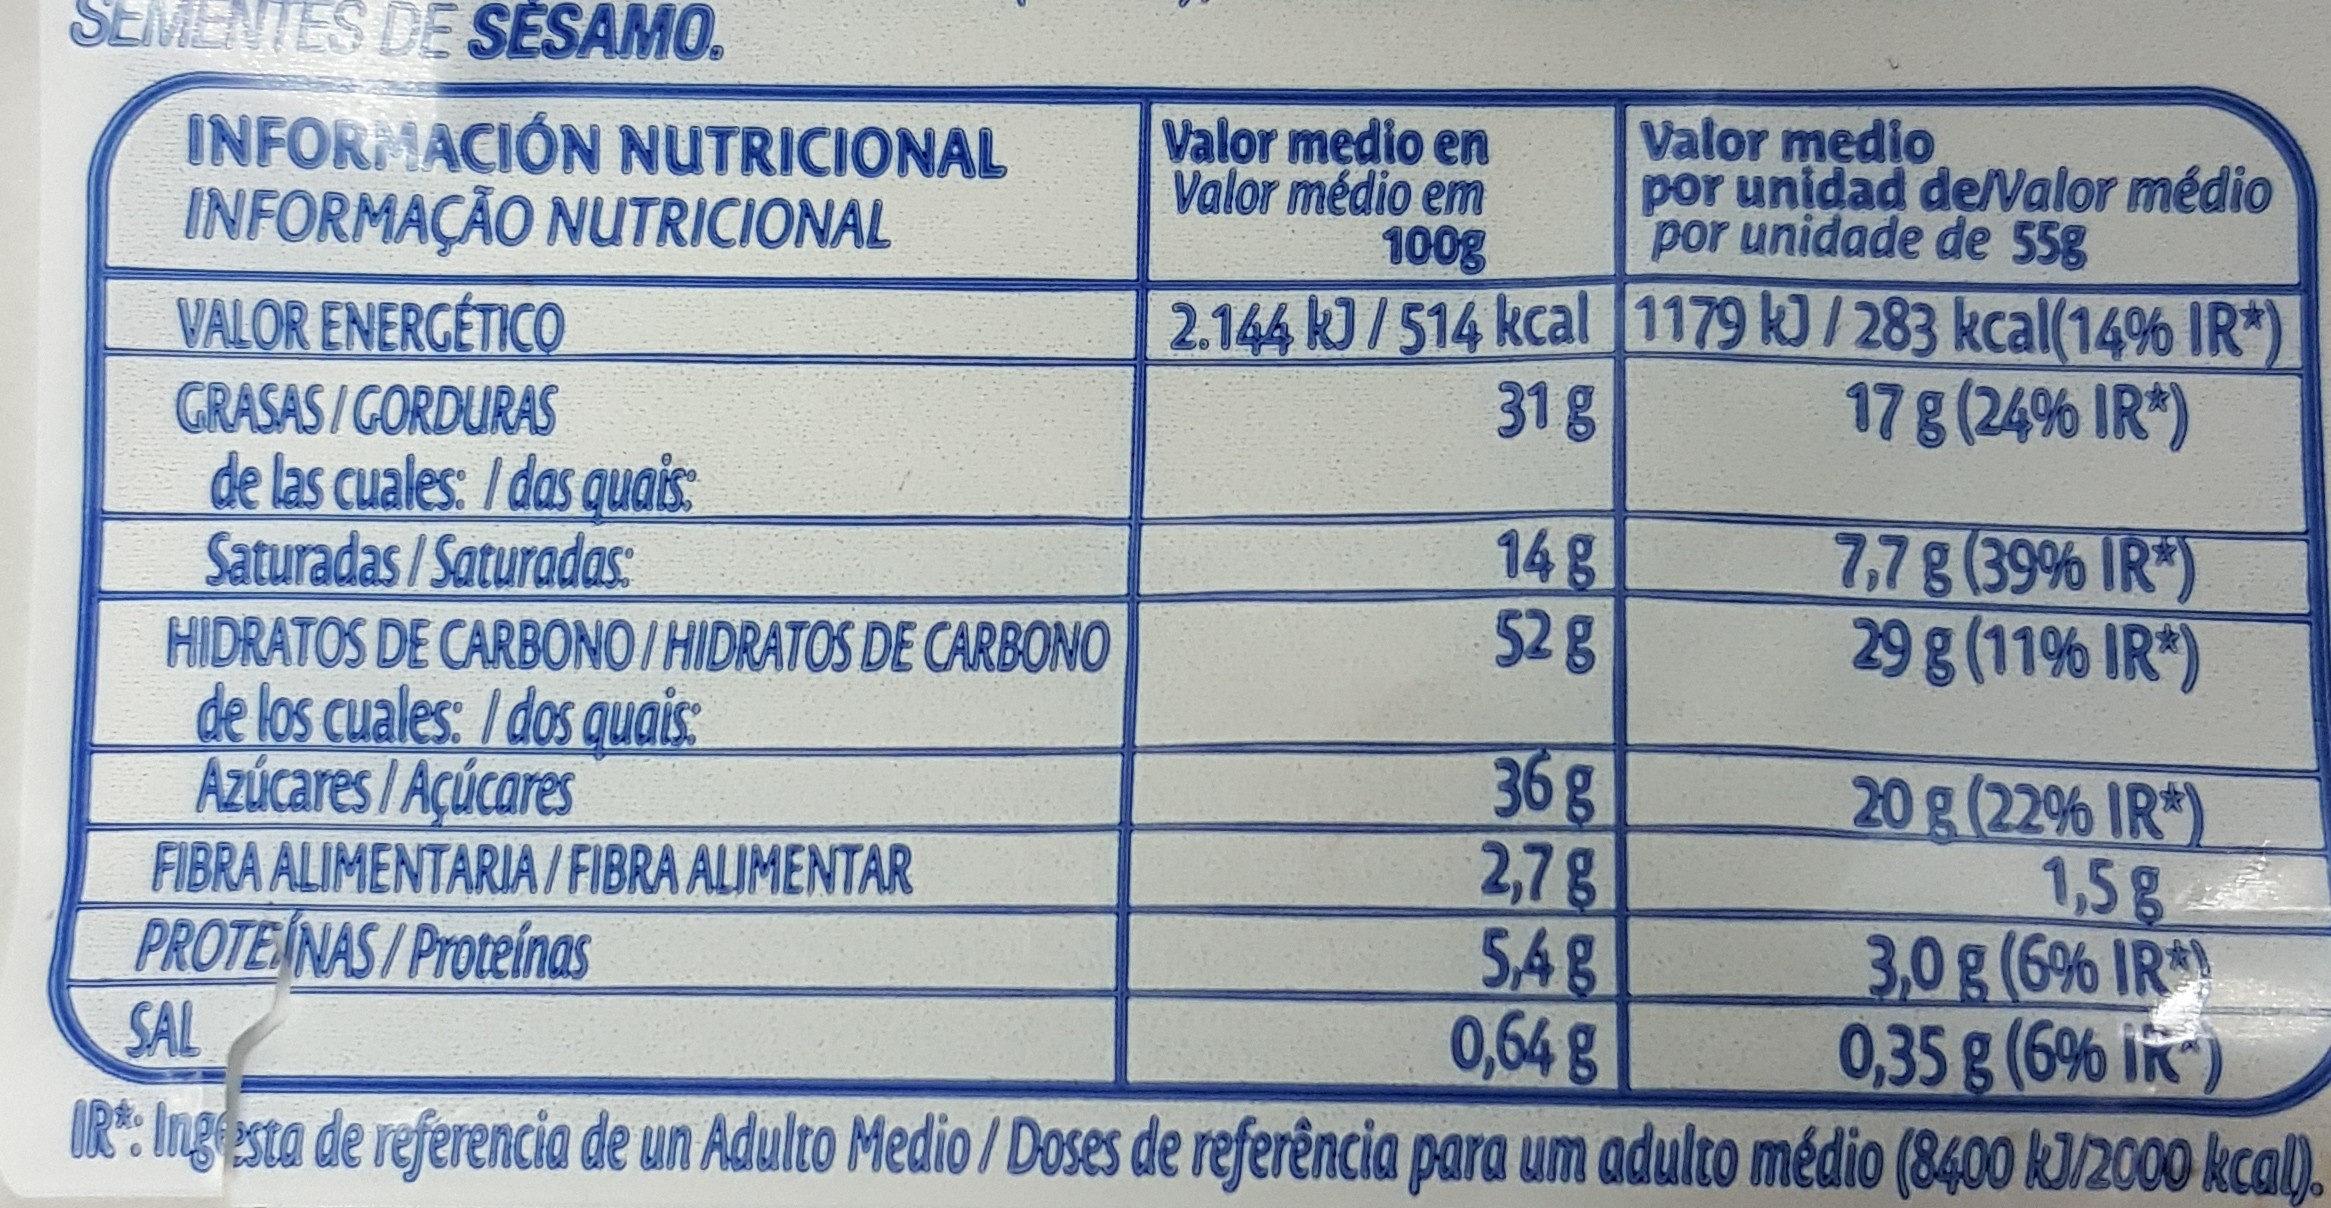 Discos de cacao - Informations nutritionnelles - es